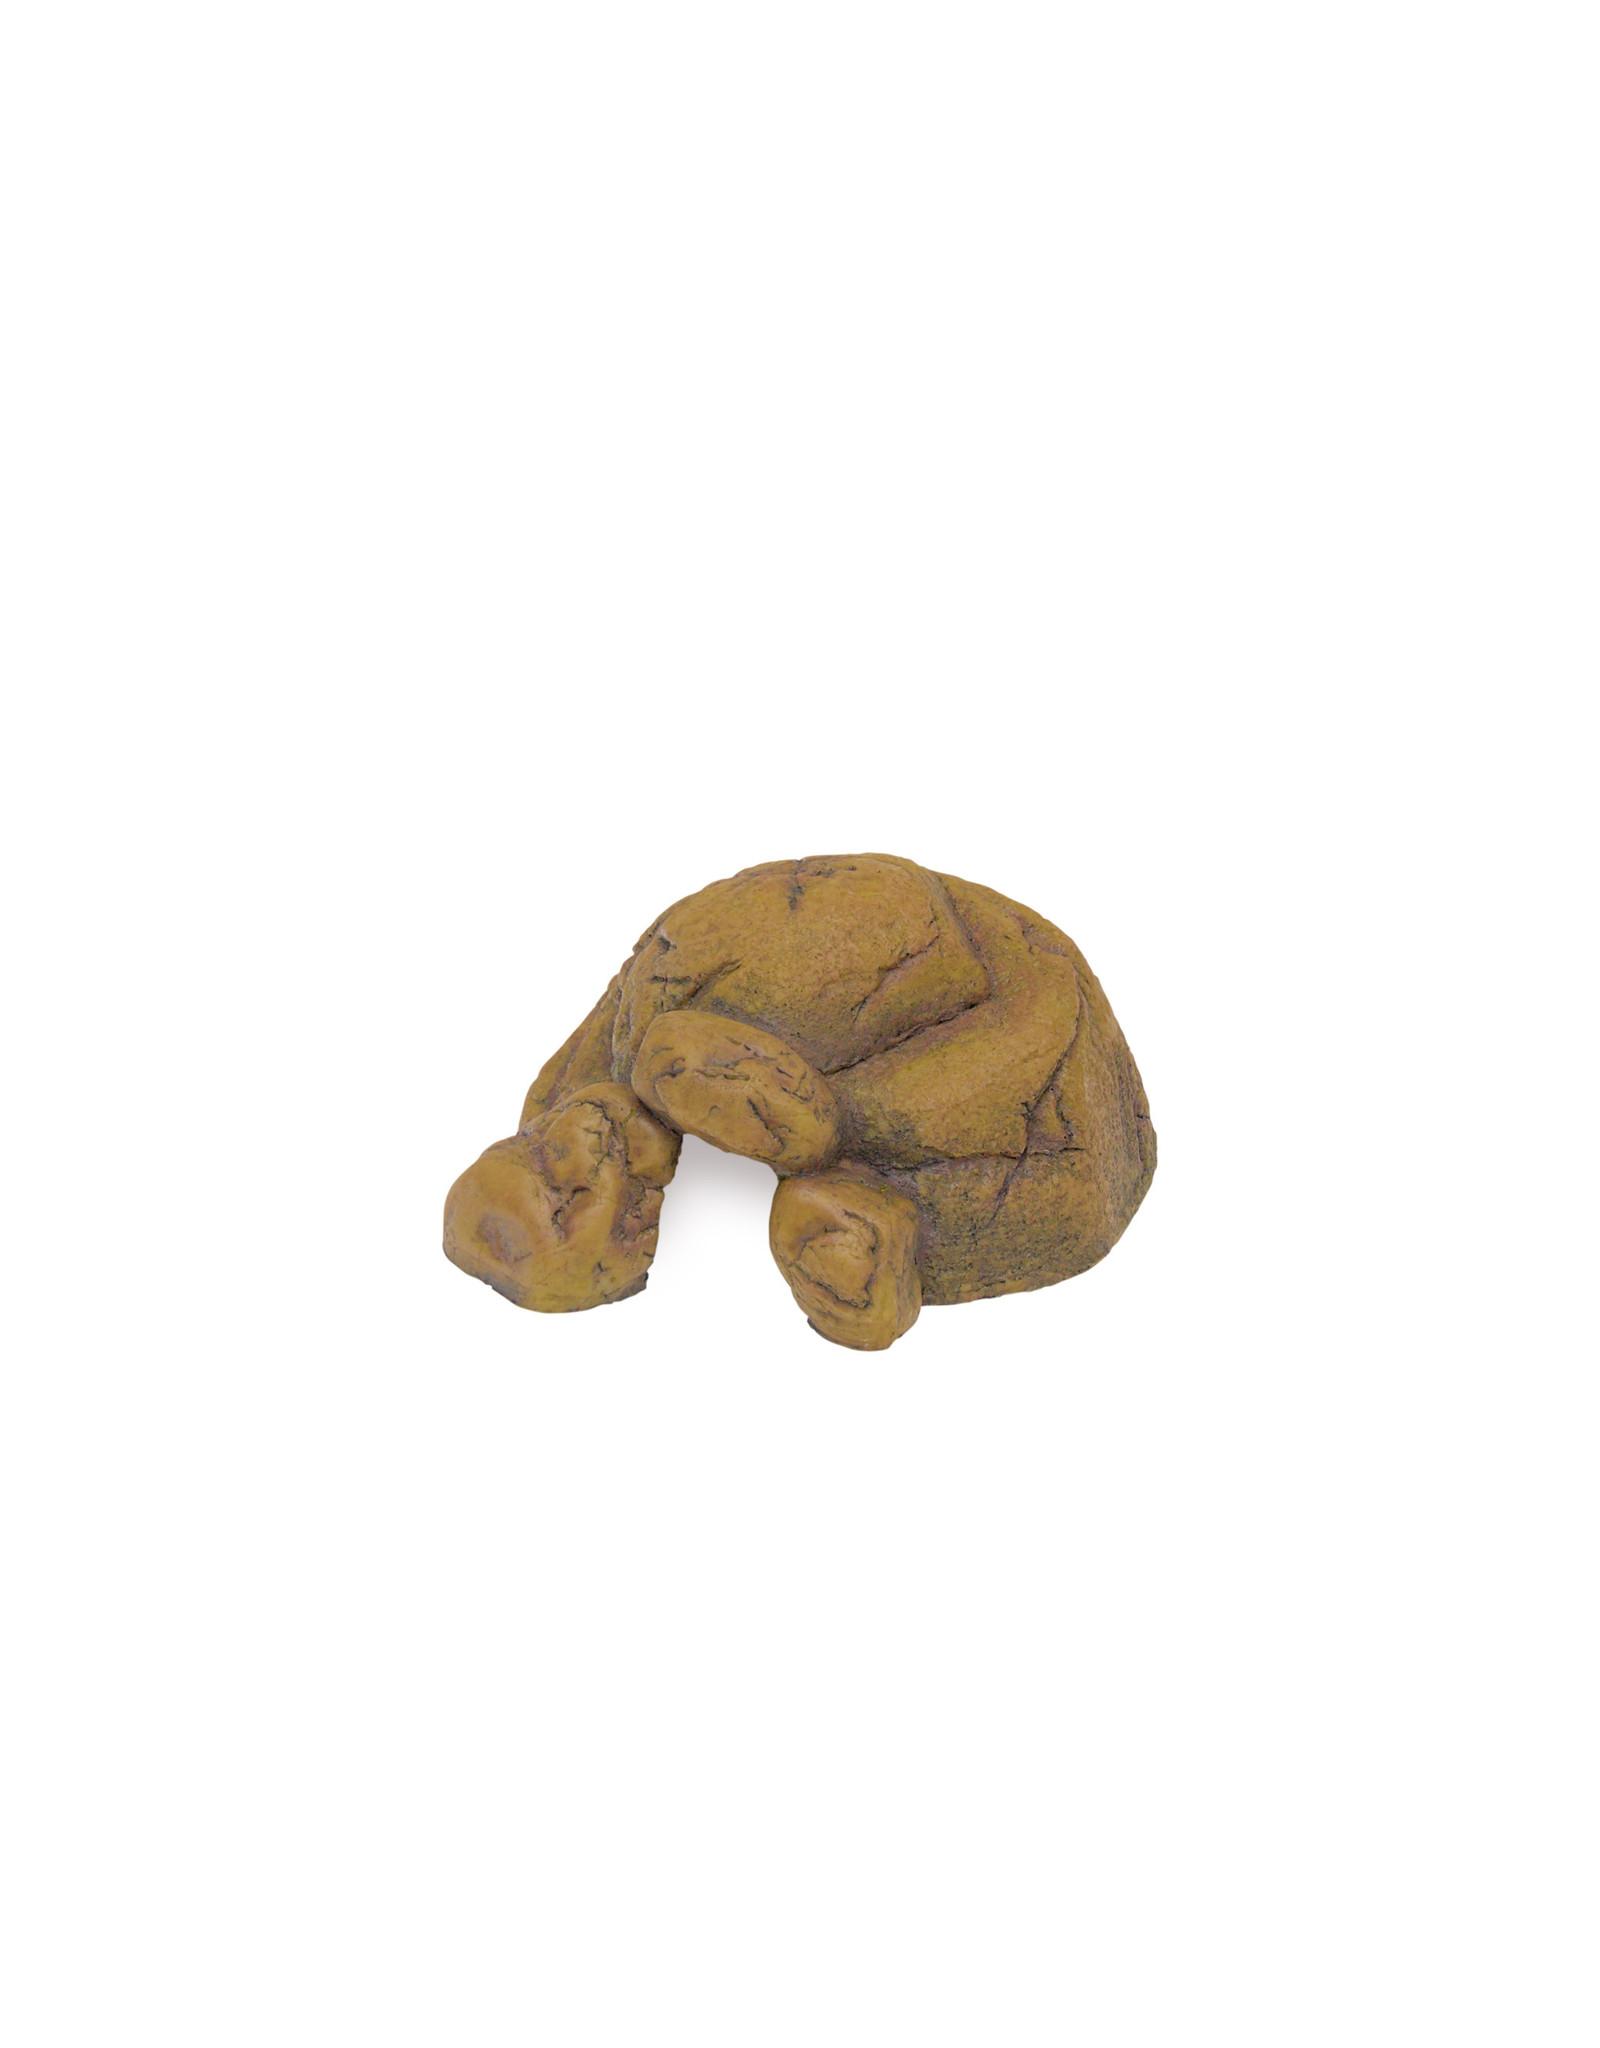 Exo Terra Reptile Cave - Small